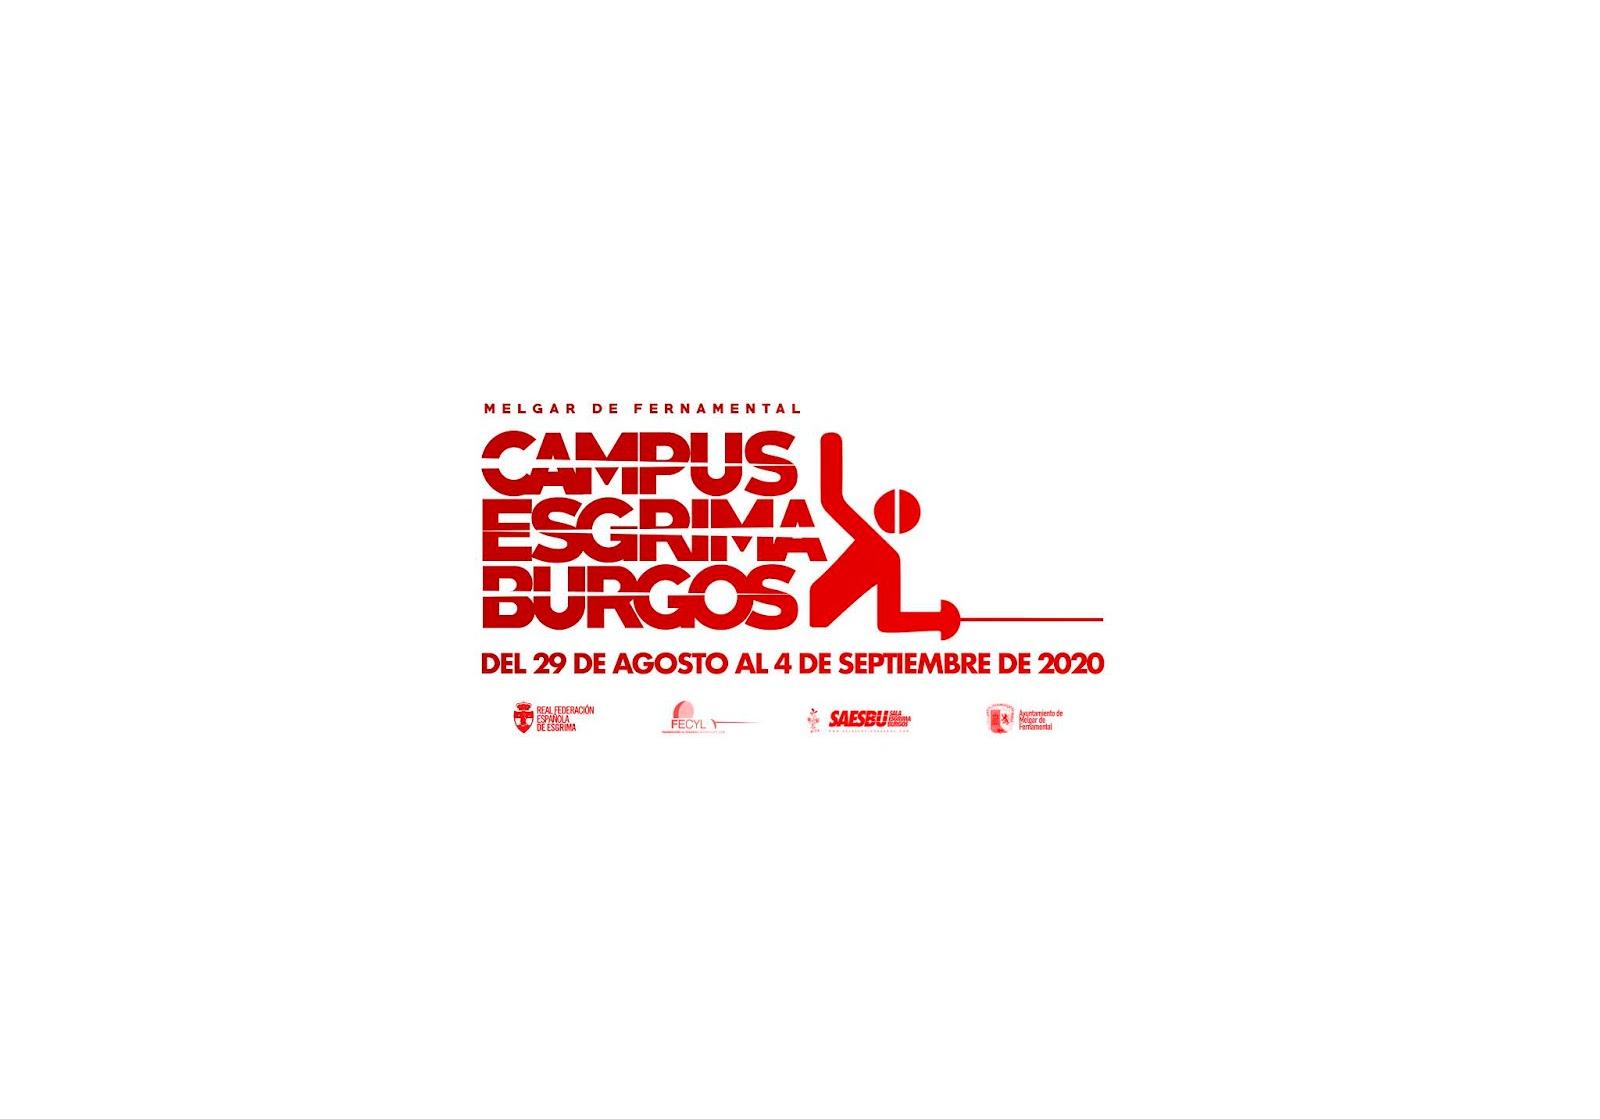 Campus Esgrima Burgos Melgar de Fernamental 2020 Saesbu verano agosto septiembre pretemporada